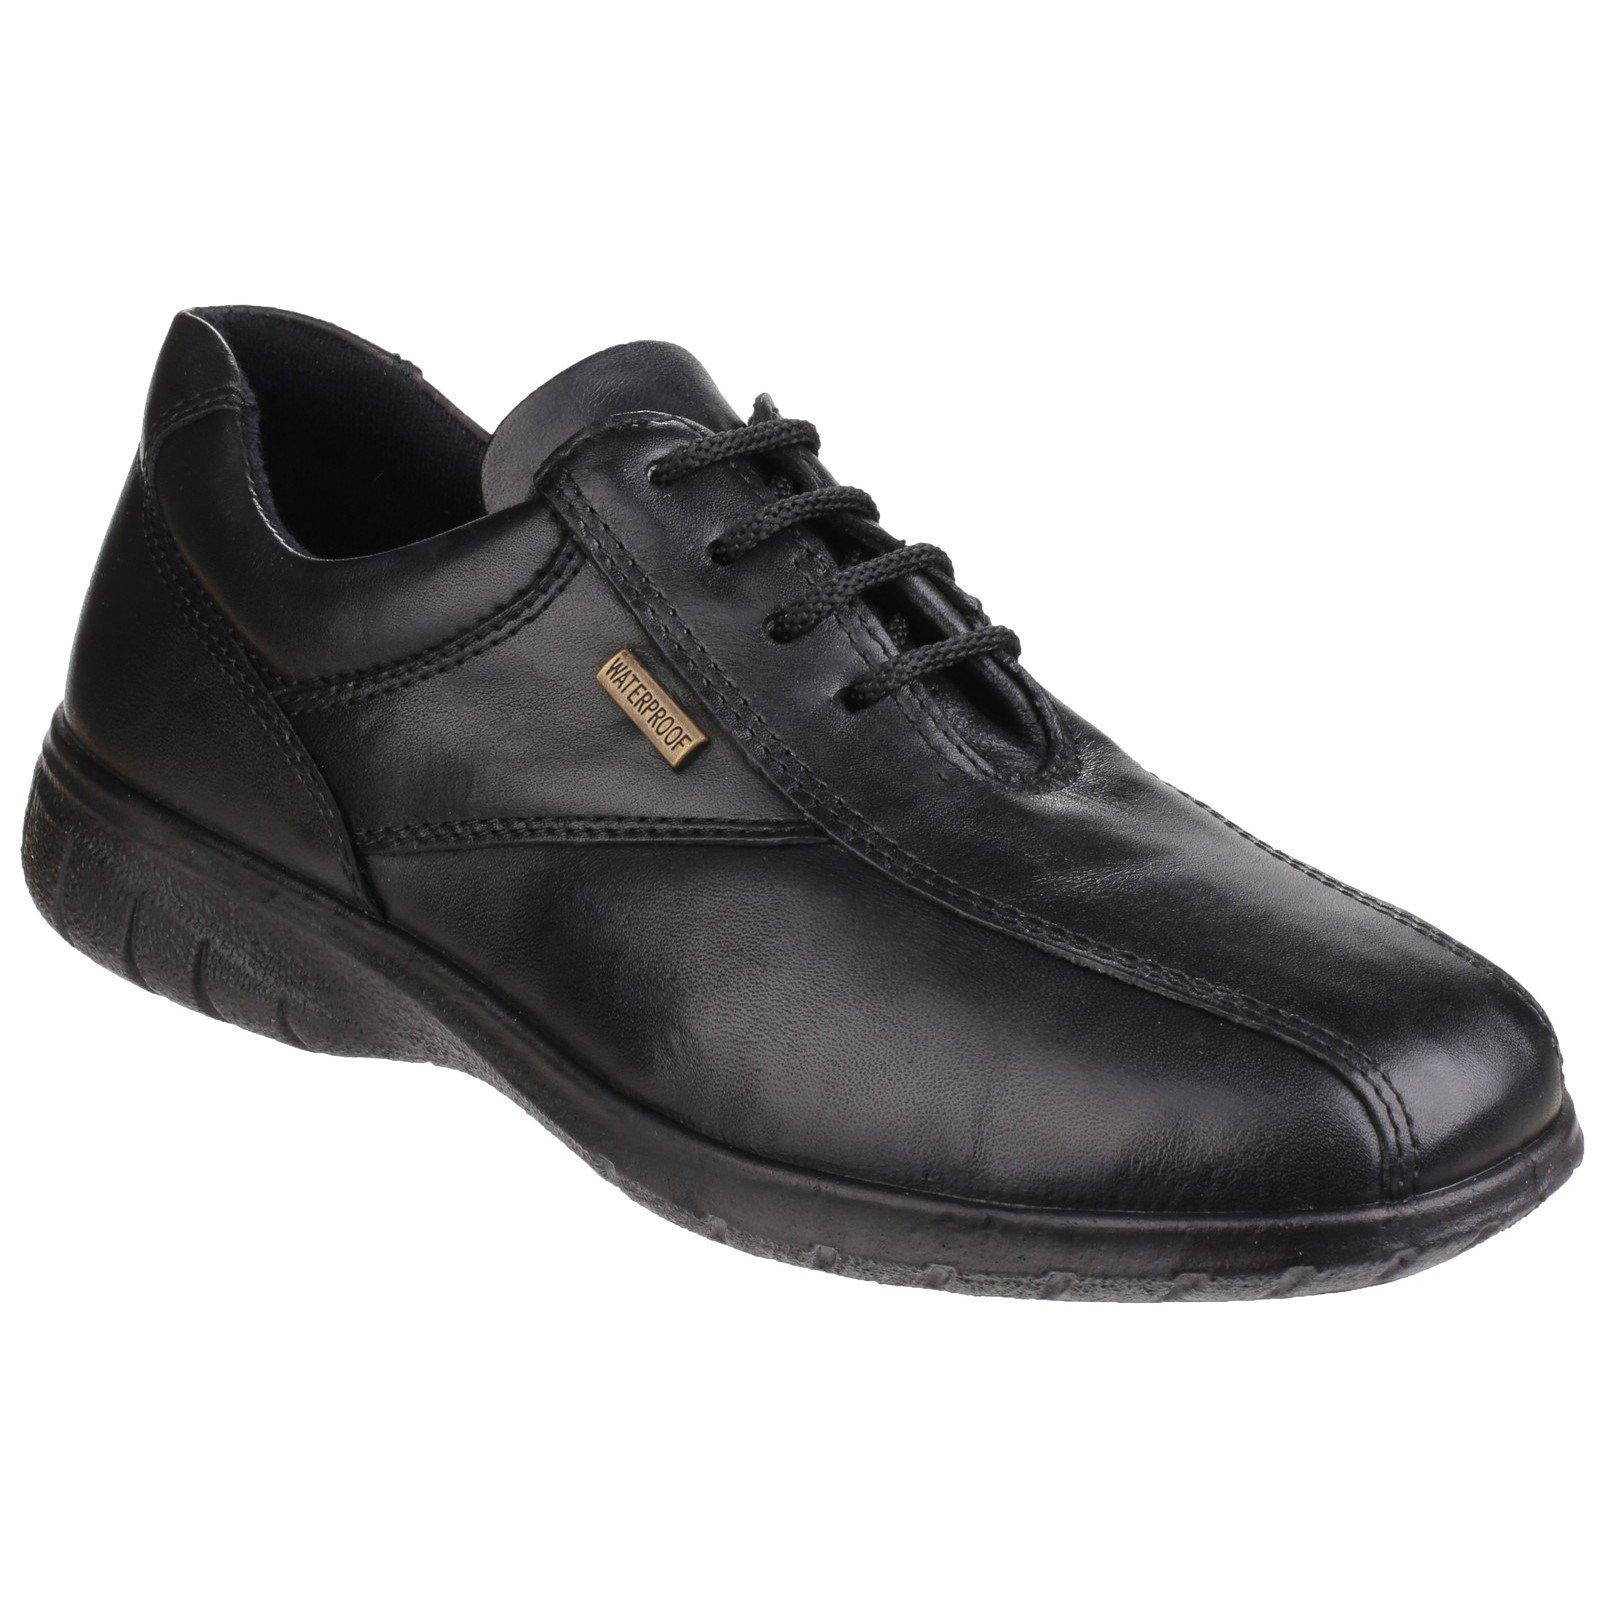 Cotswold Women's Collection Salford Shoe Various Colours 32981 - Black 8